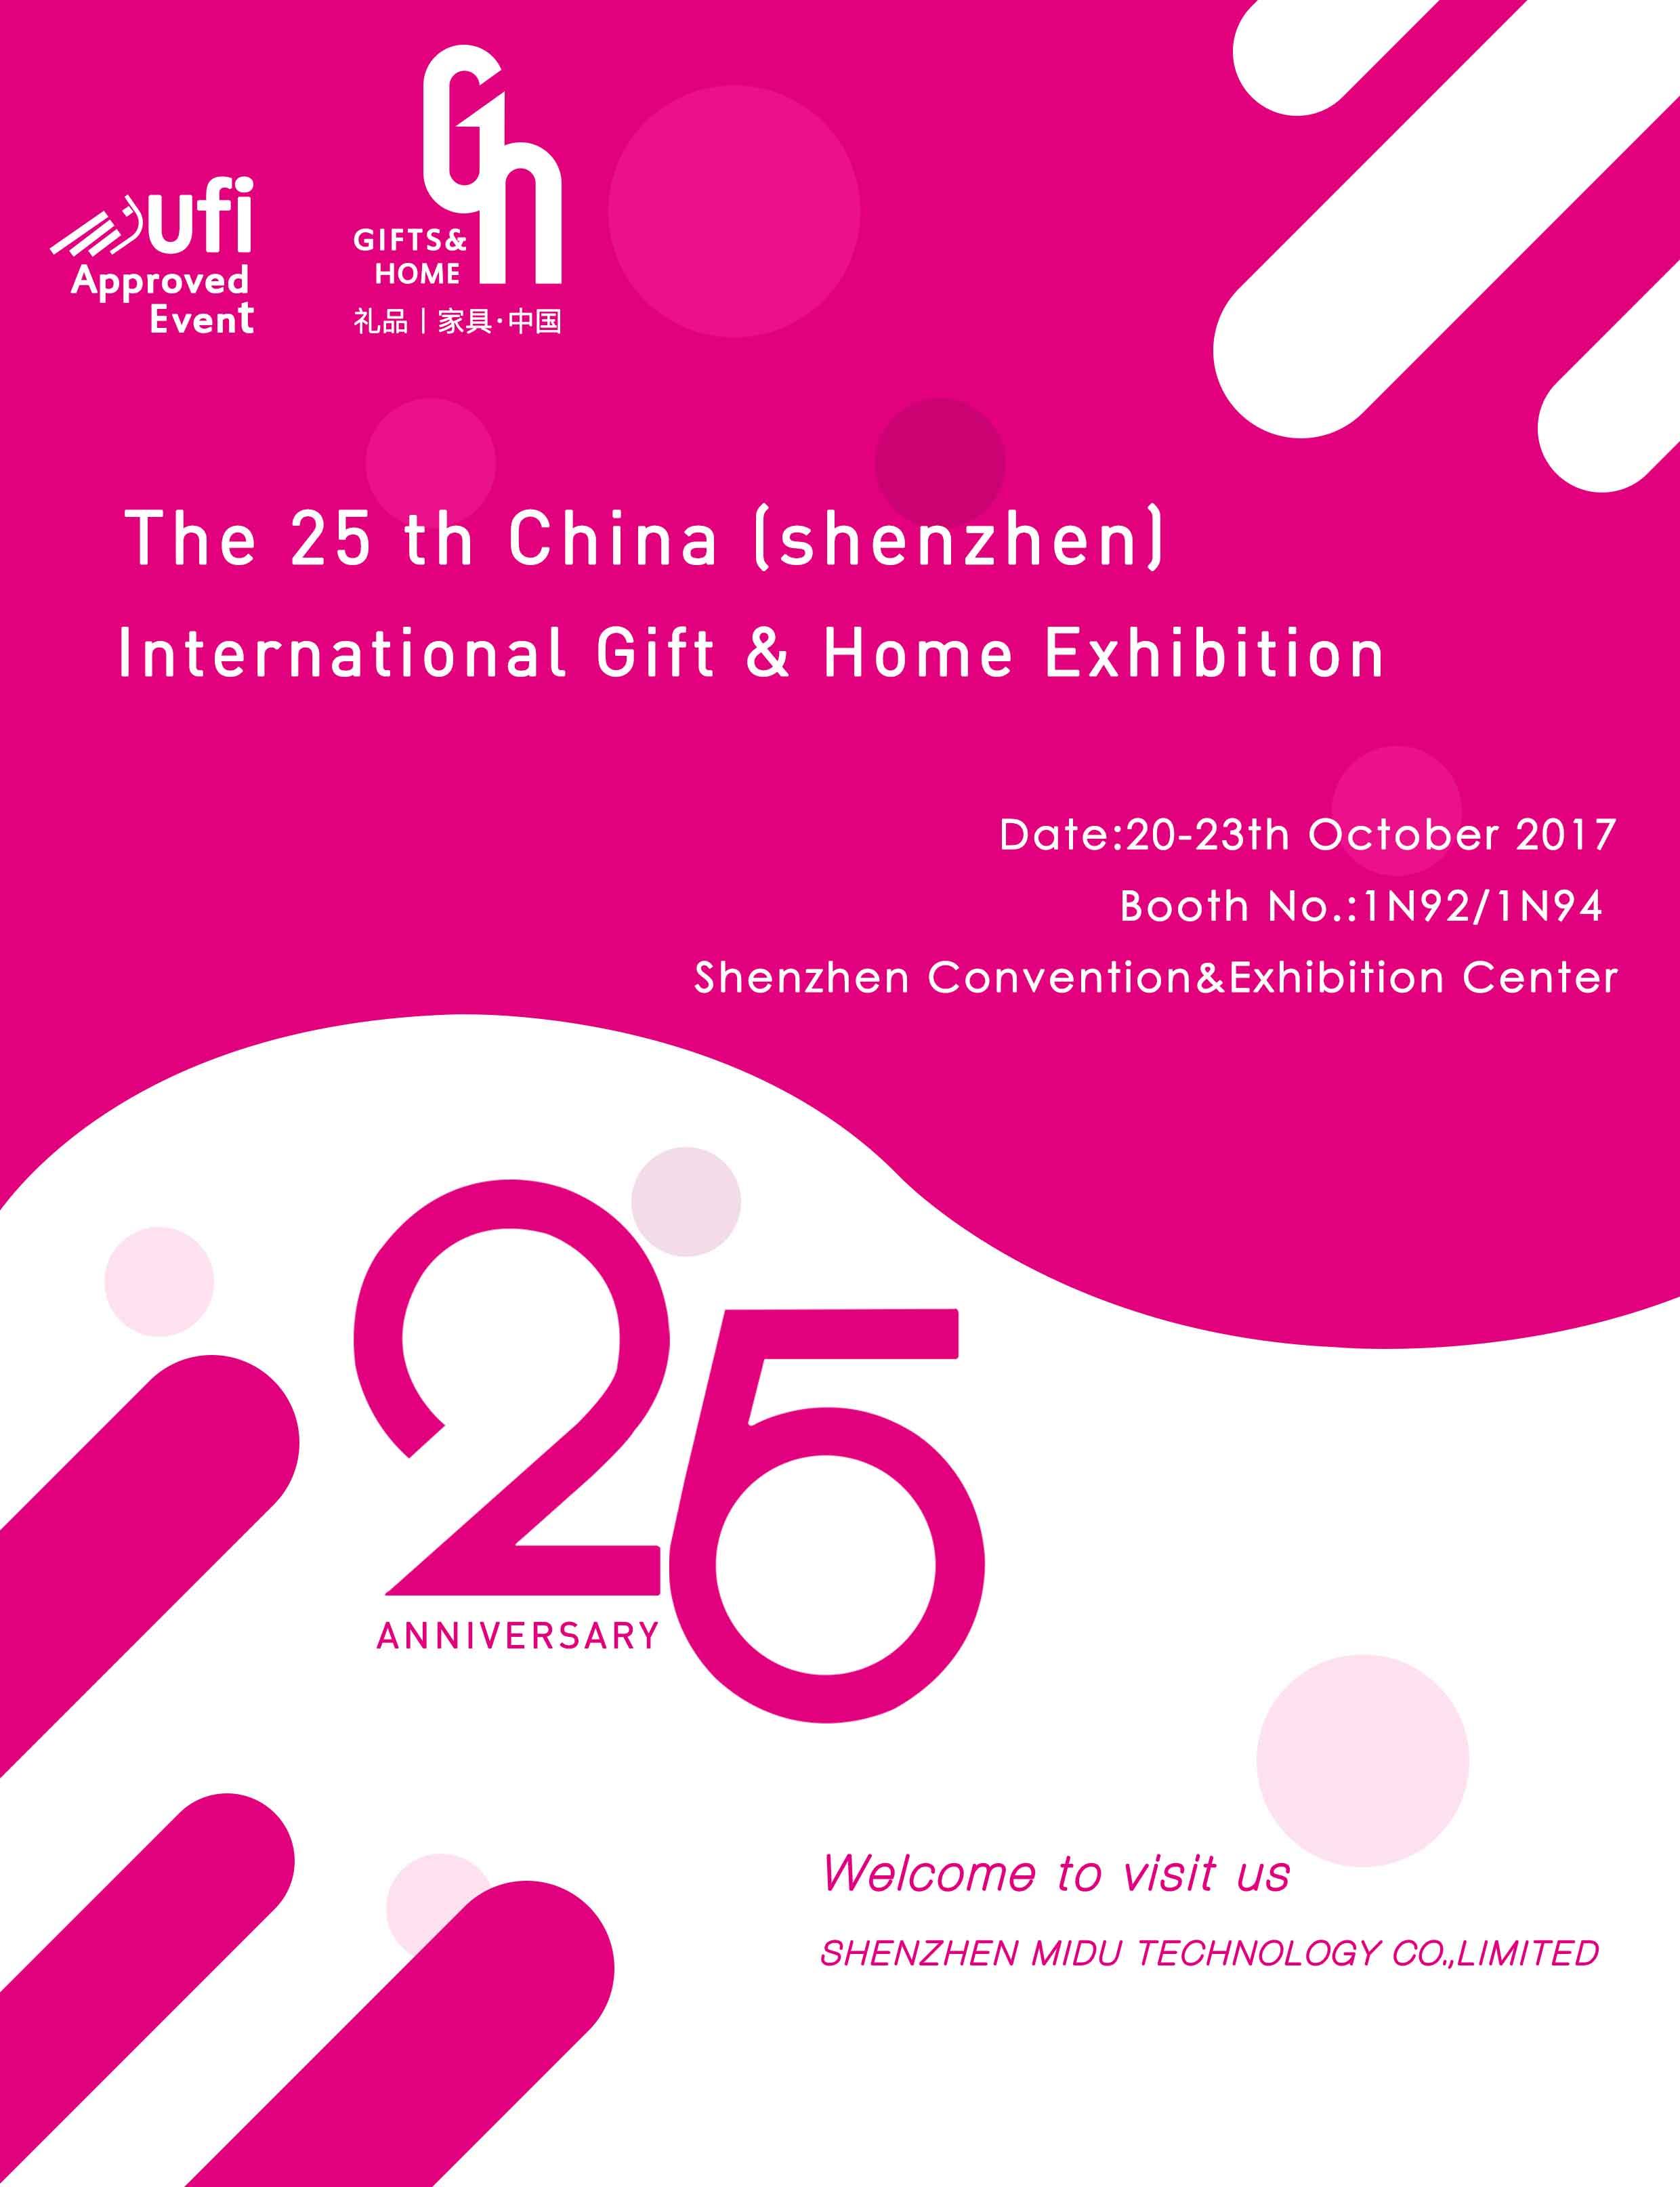 The 25th China(Shenzhen) International Gifts